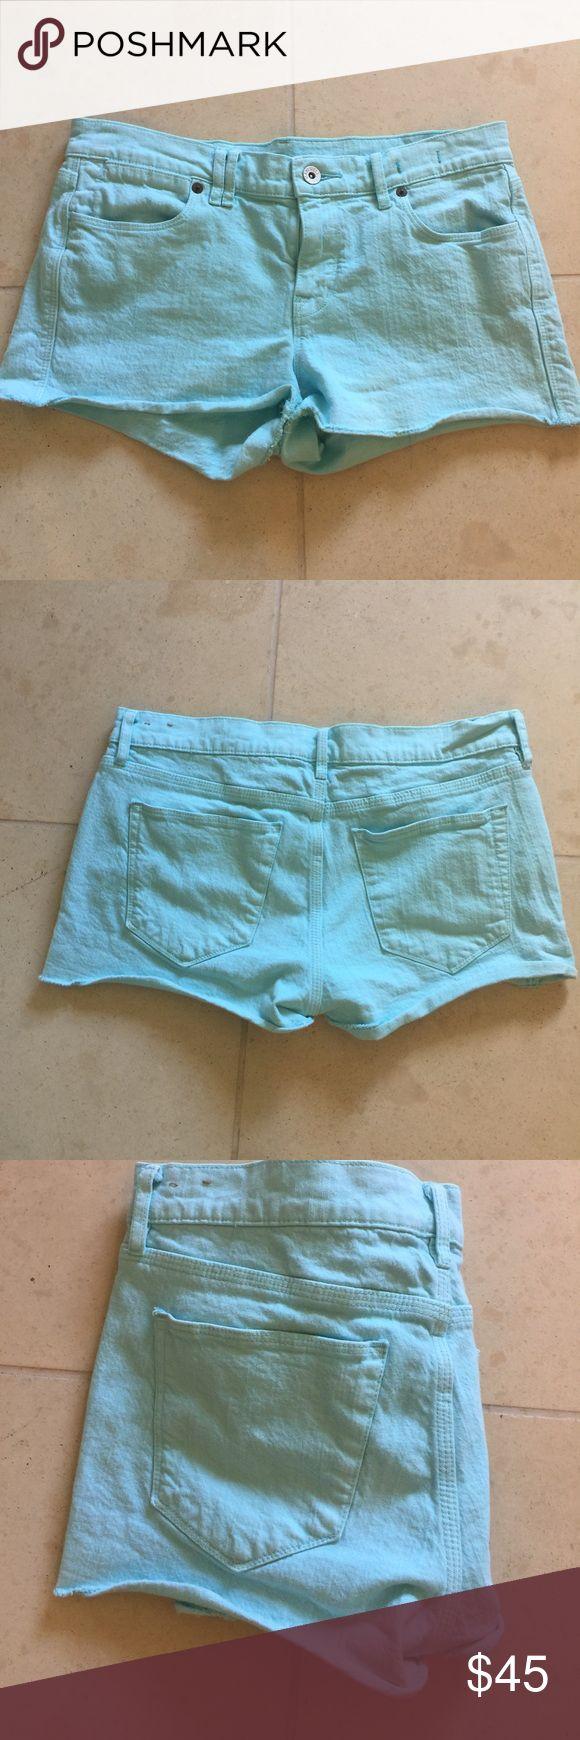 "Madewell Turquoise Shorts Madewell Turquoise Shorts. Size 27. Waist 15 1/2"", Length 10"" Madewell Shorts Jean Shorts"